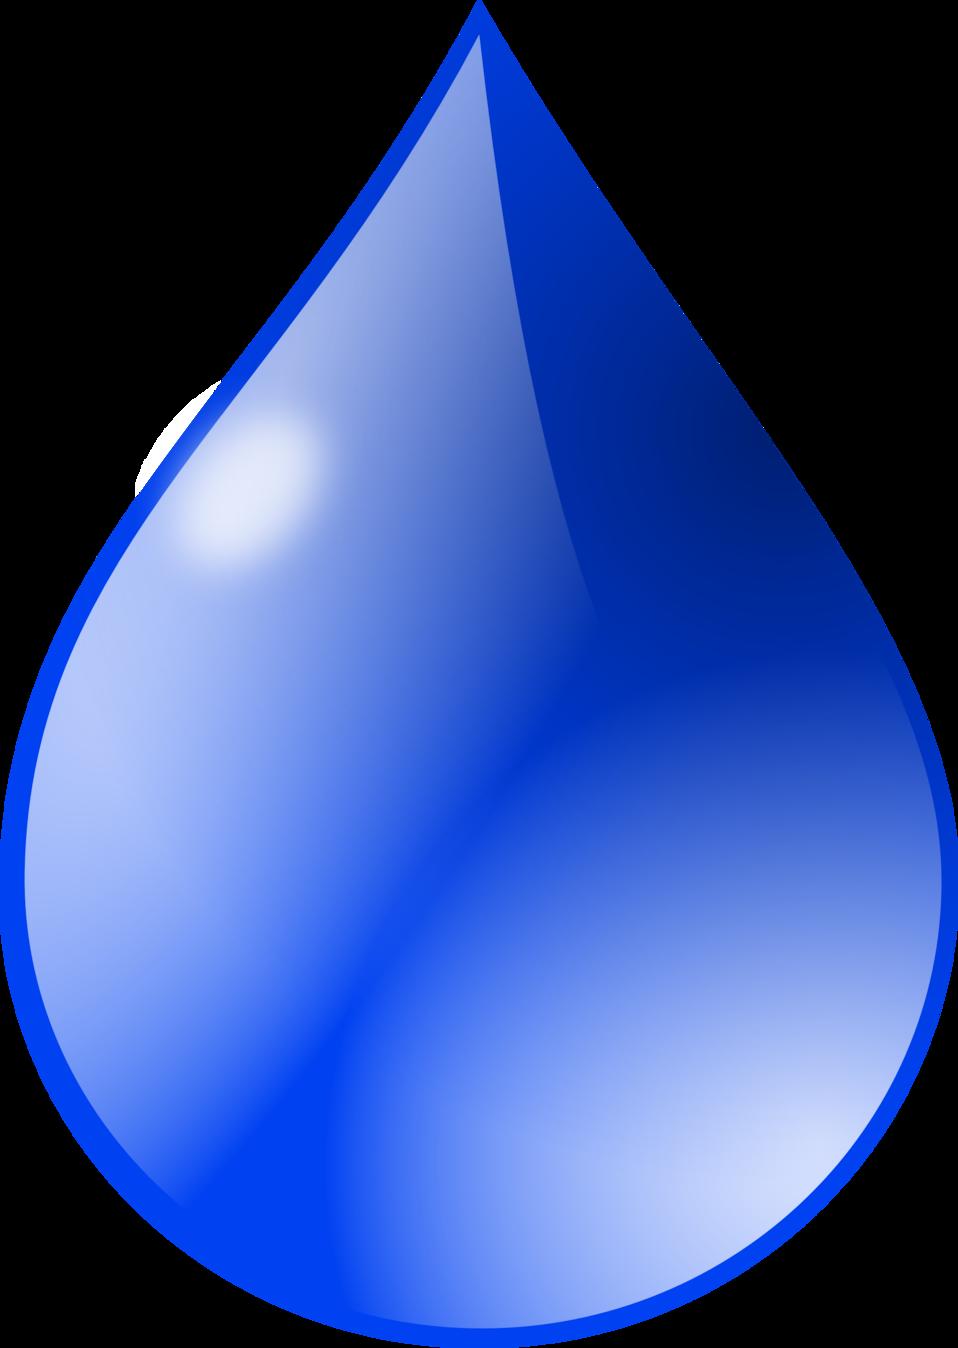 Public domain clip art. Clipart water circle